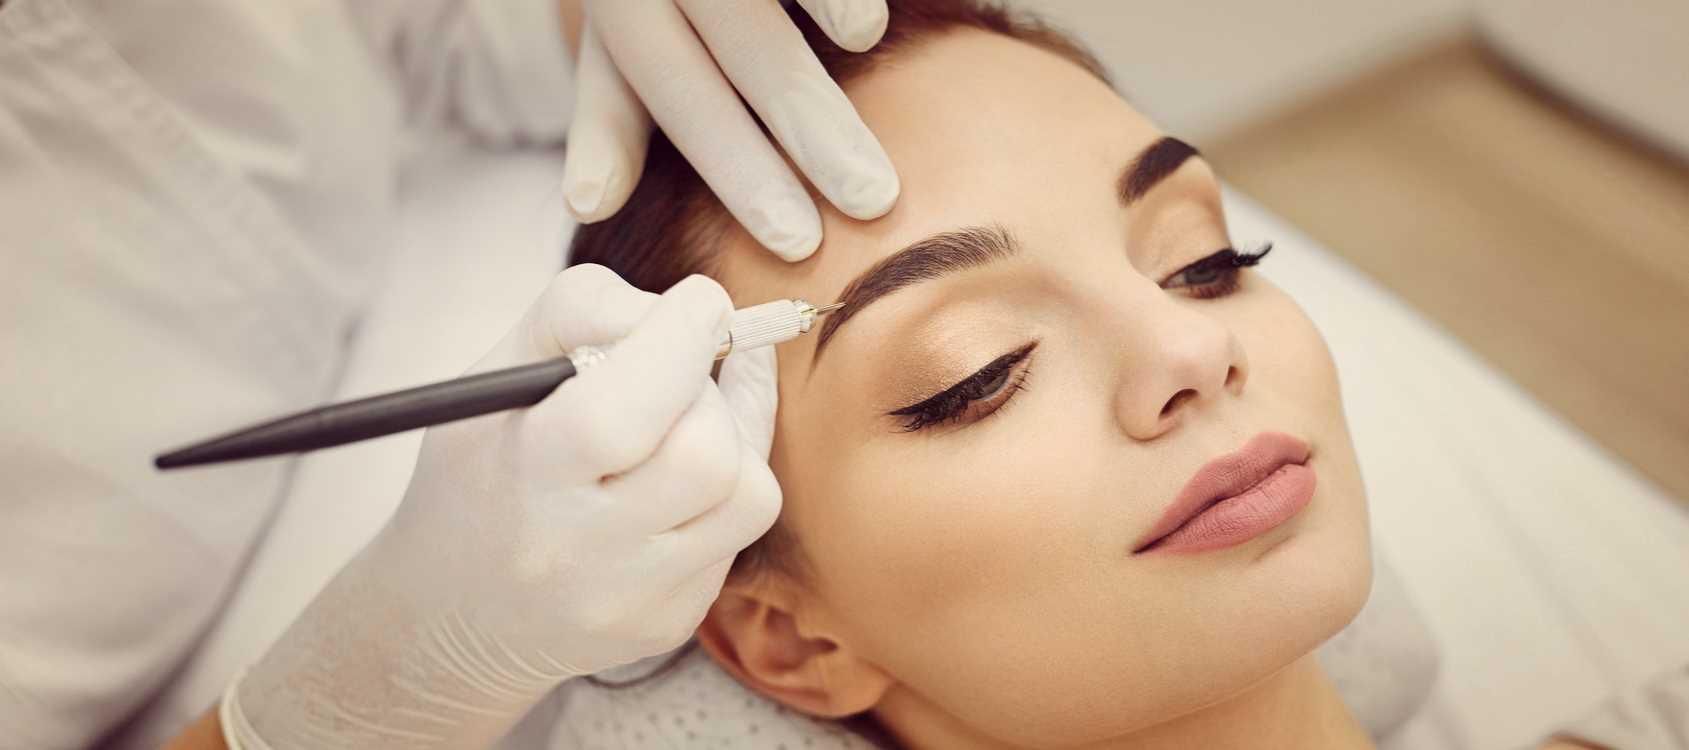 Microblading - Permanent Makeup in Springfield Missouri